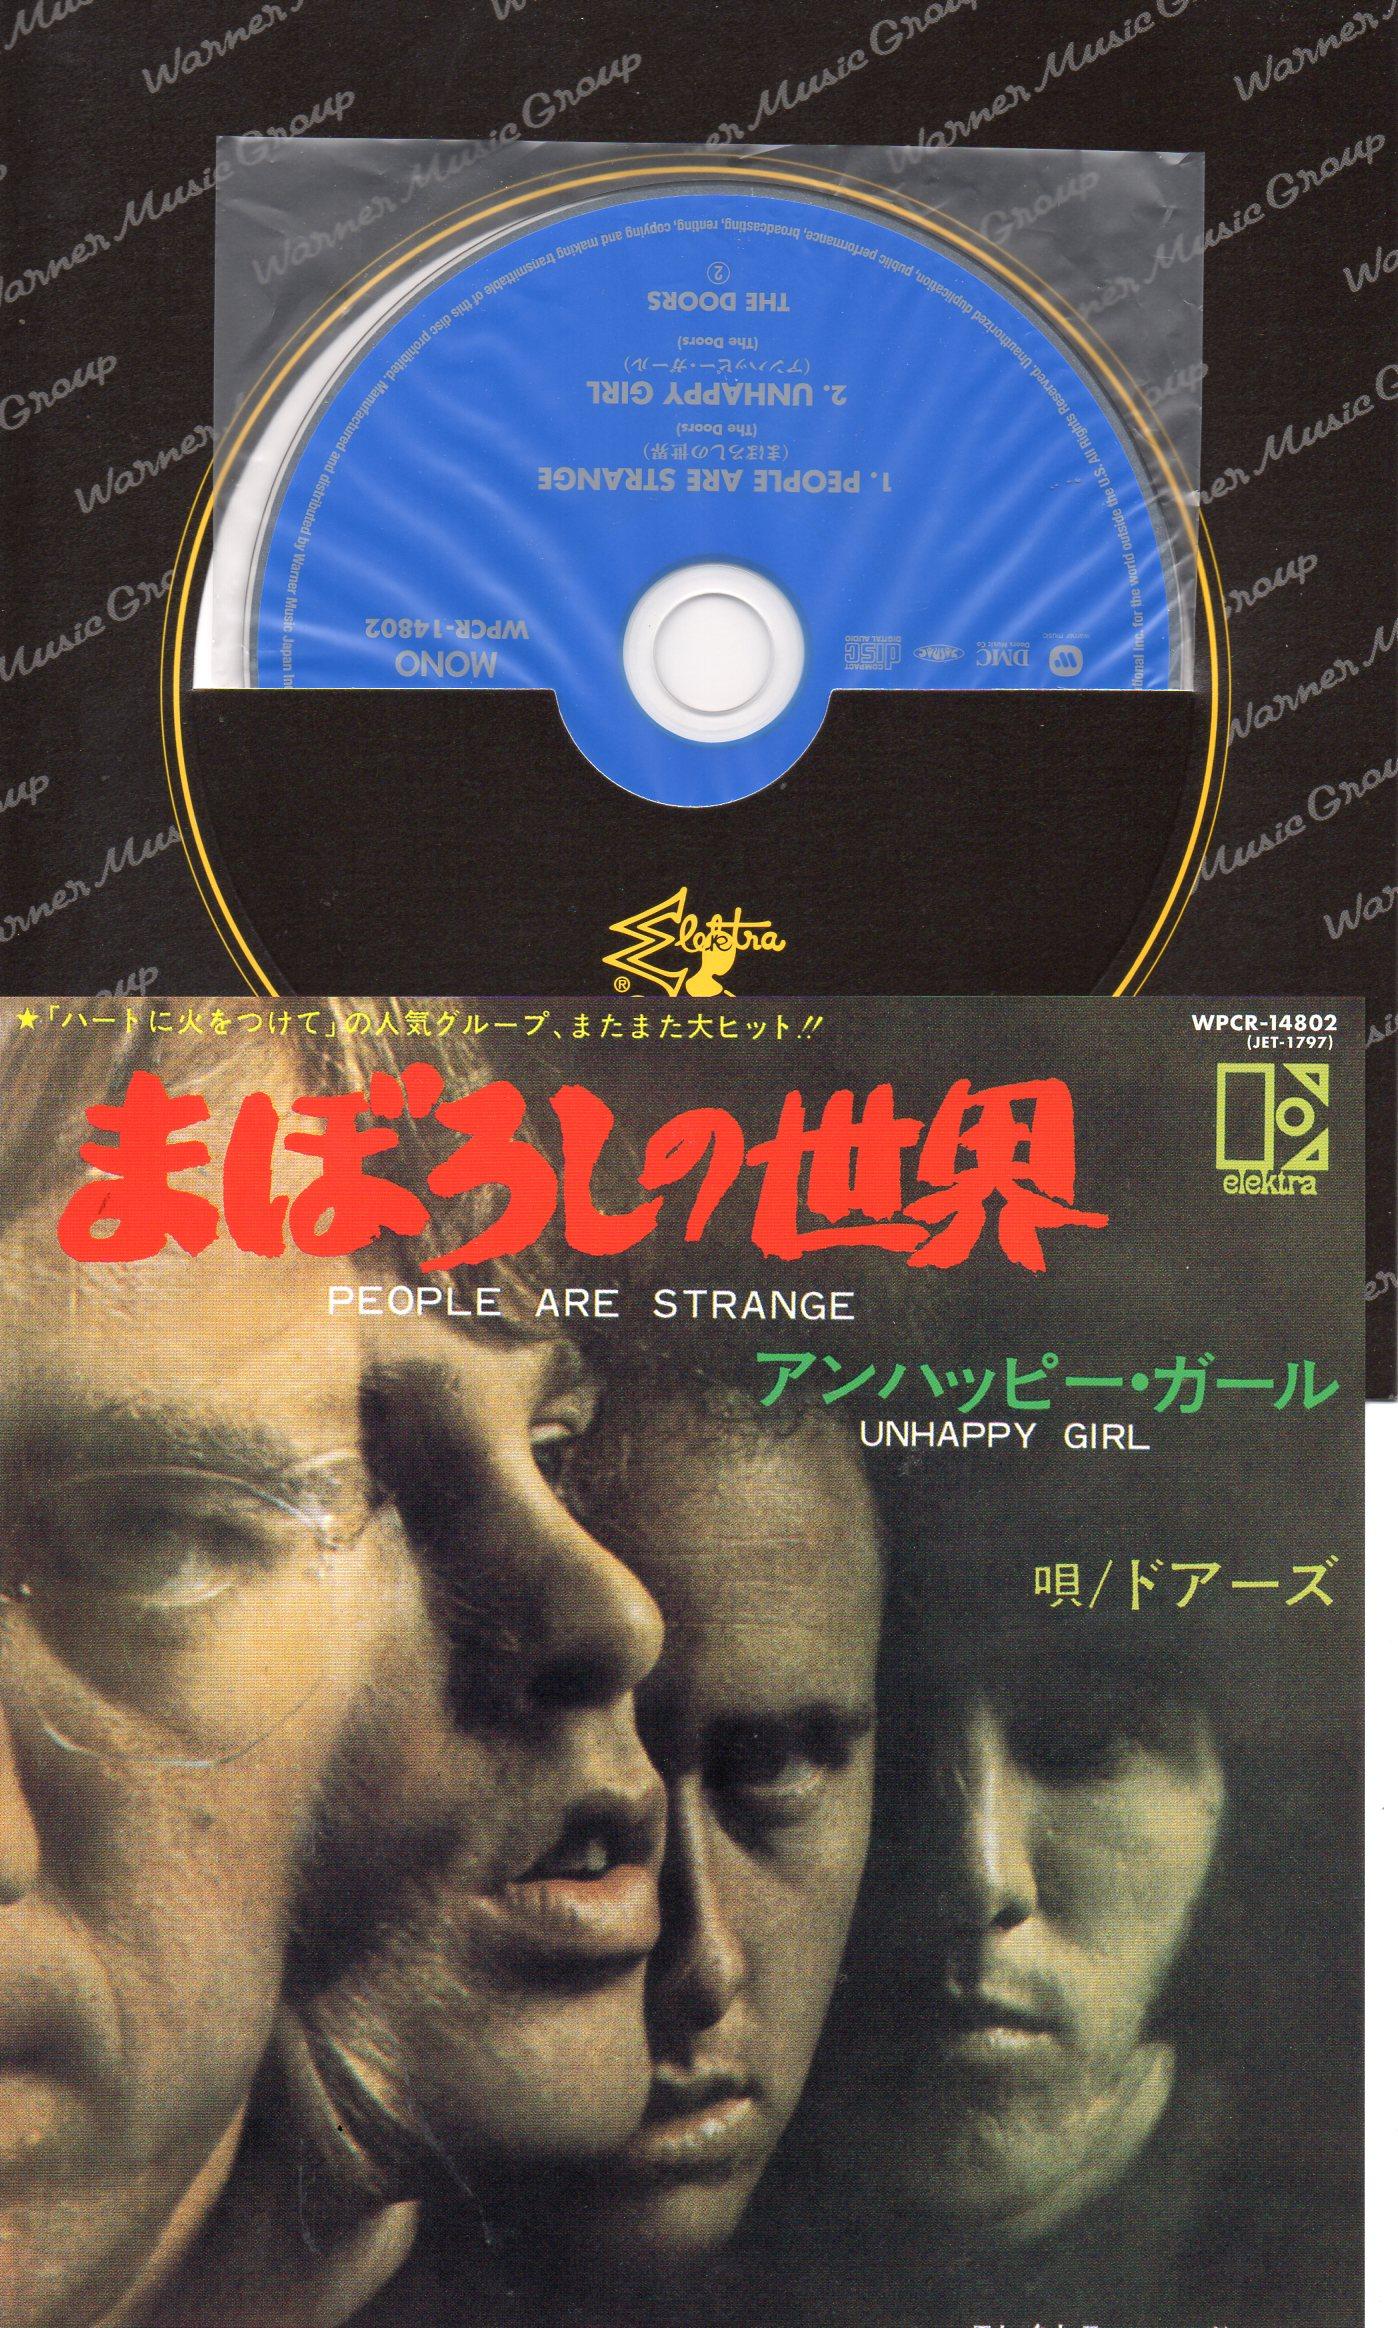 THE DOORS - Strange Days 10-TRACK + 2 BONUS TRACKS - CD